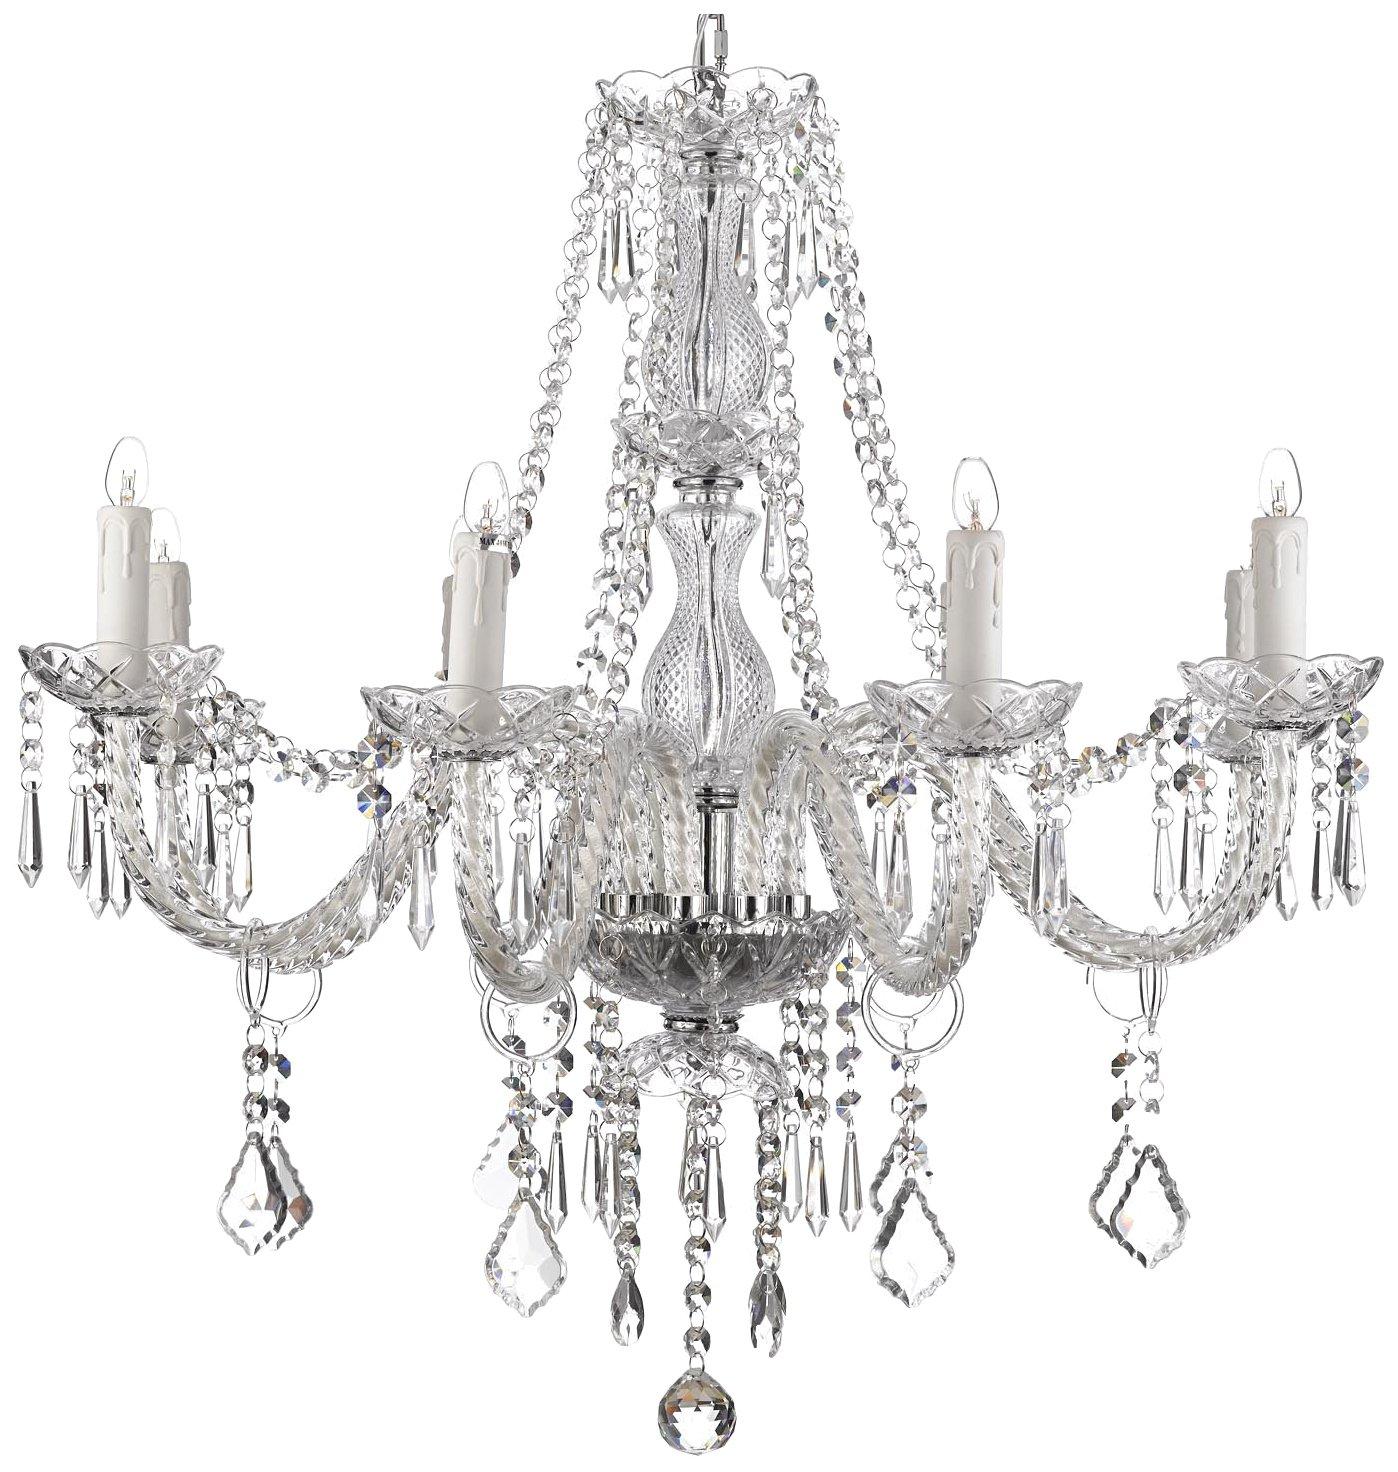 Crystal chandelier lighting 28ht x 28wd 8 lights fixture pendant crystal chandelier lighting 28ht x 28wd 8 lights fixture pendant ceiling lamp amazon arubaitofo Images